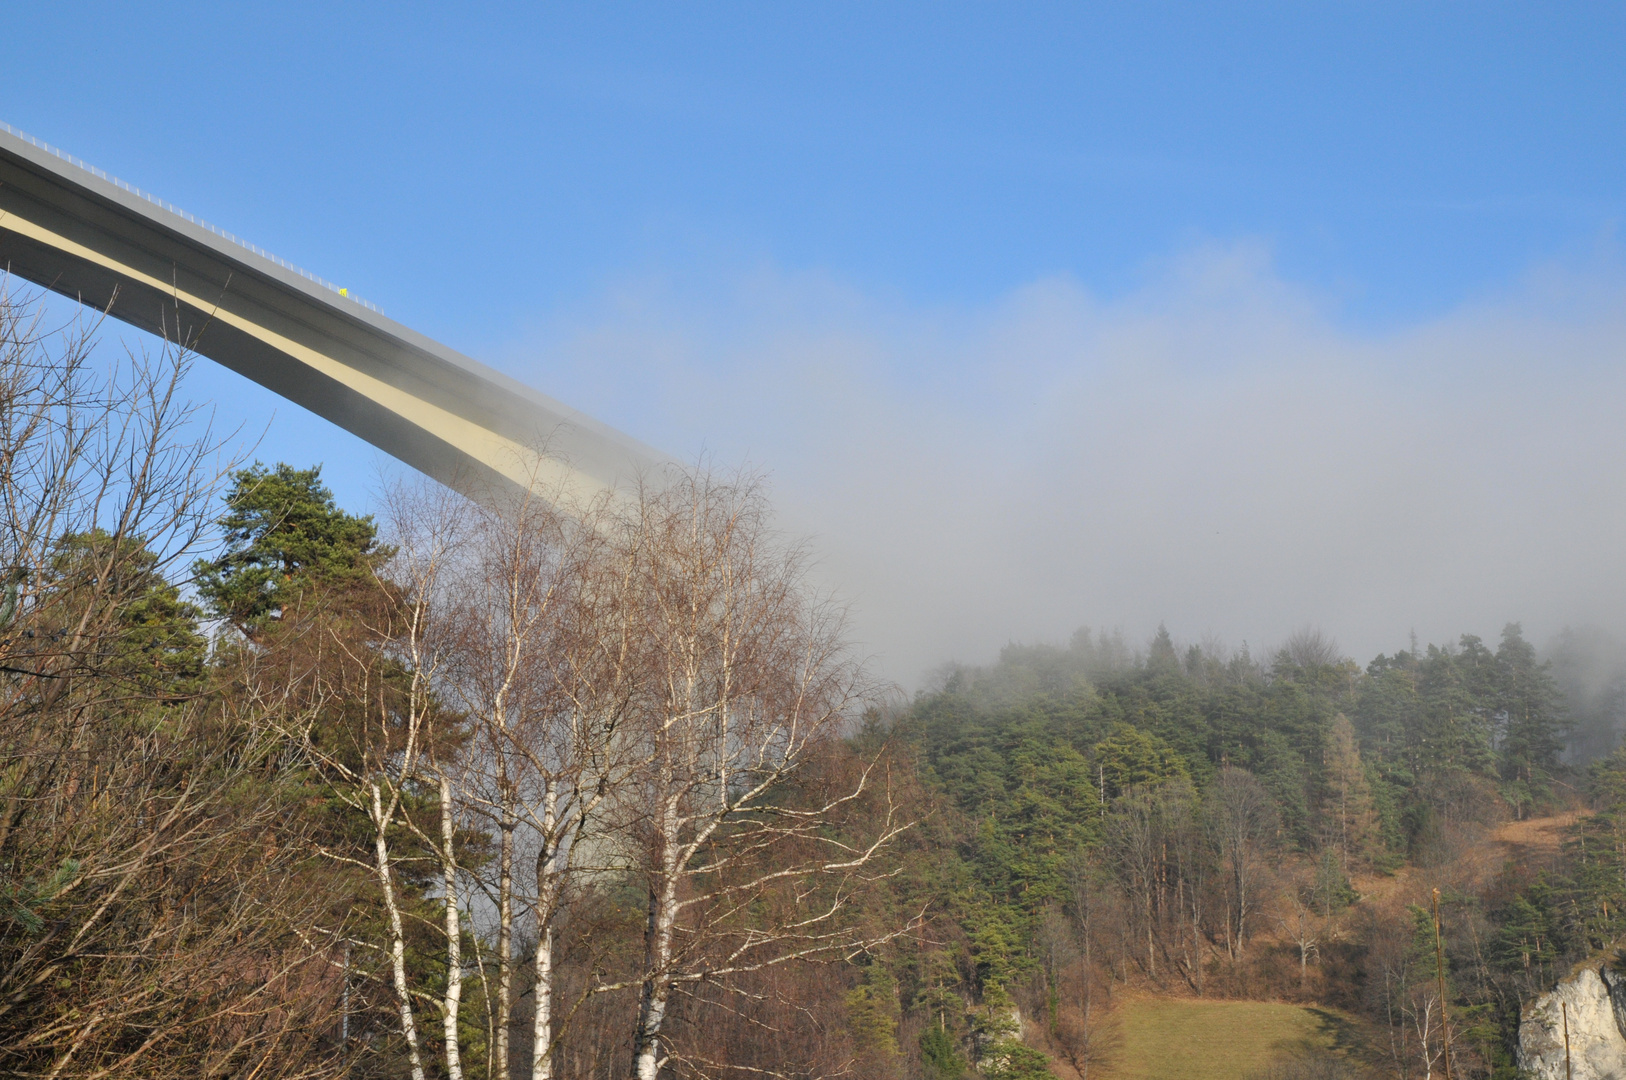 Brücke aus dem nichts